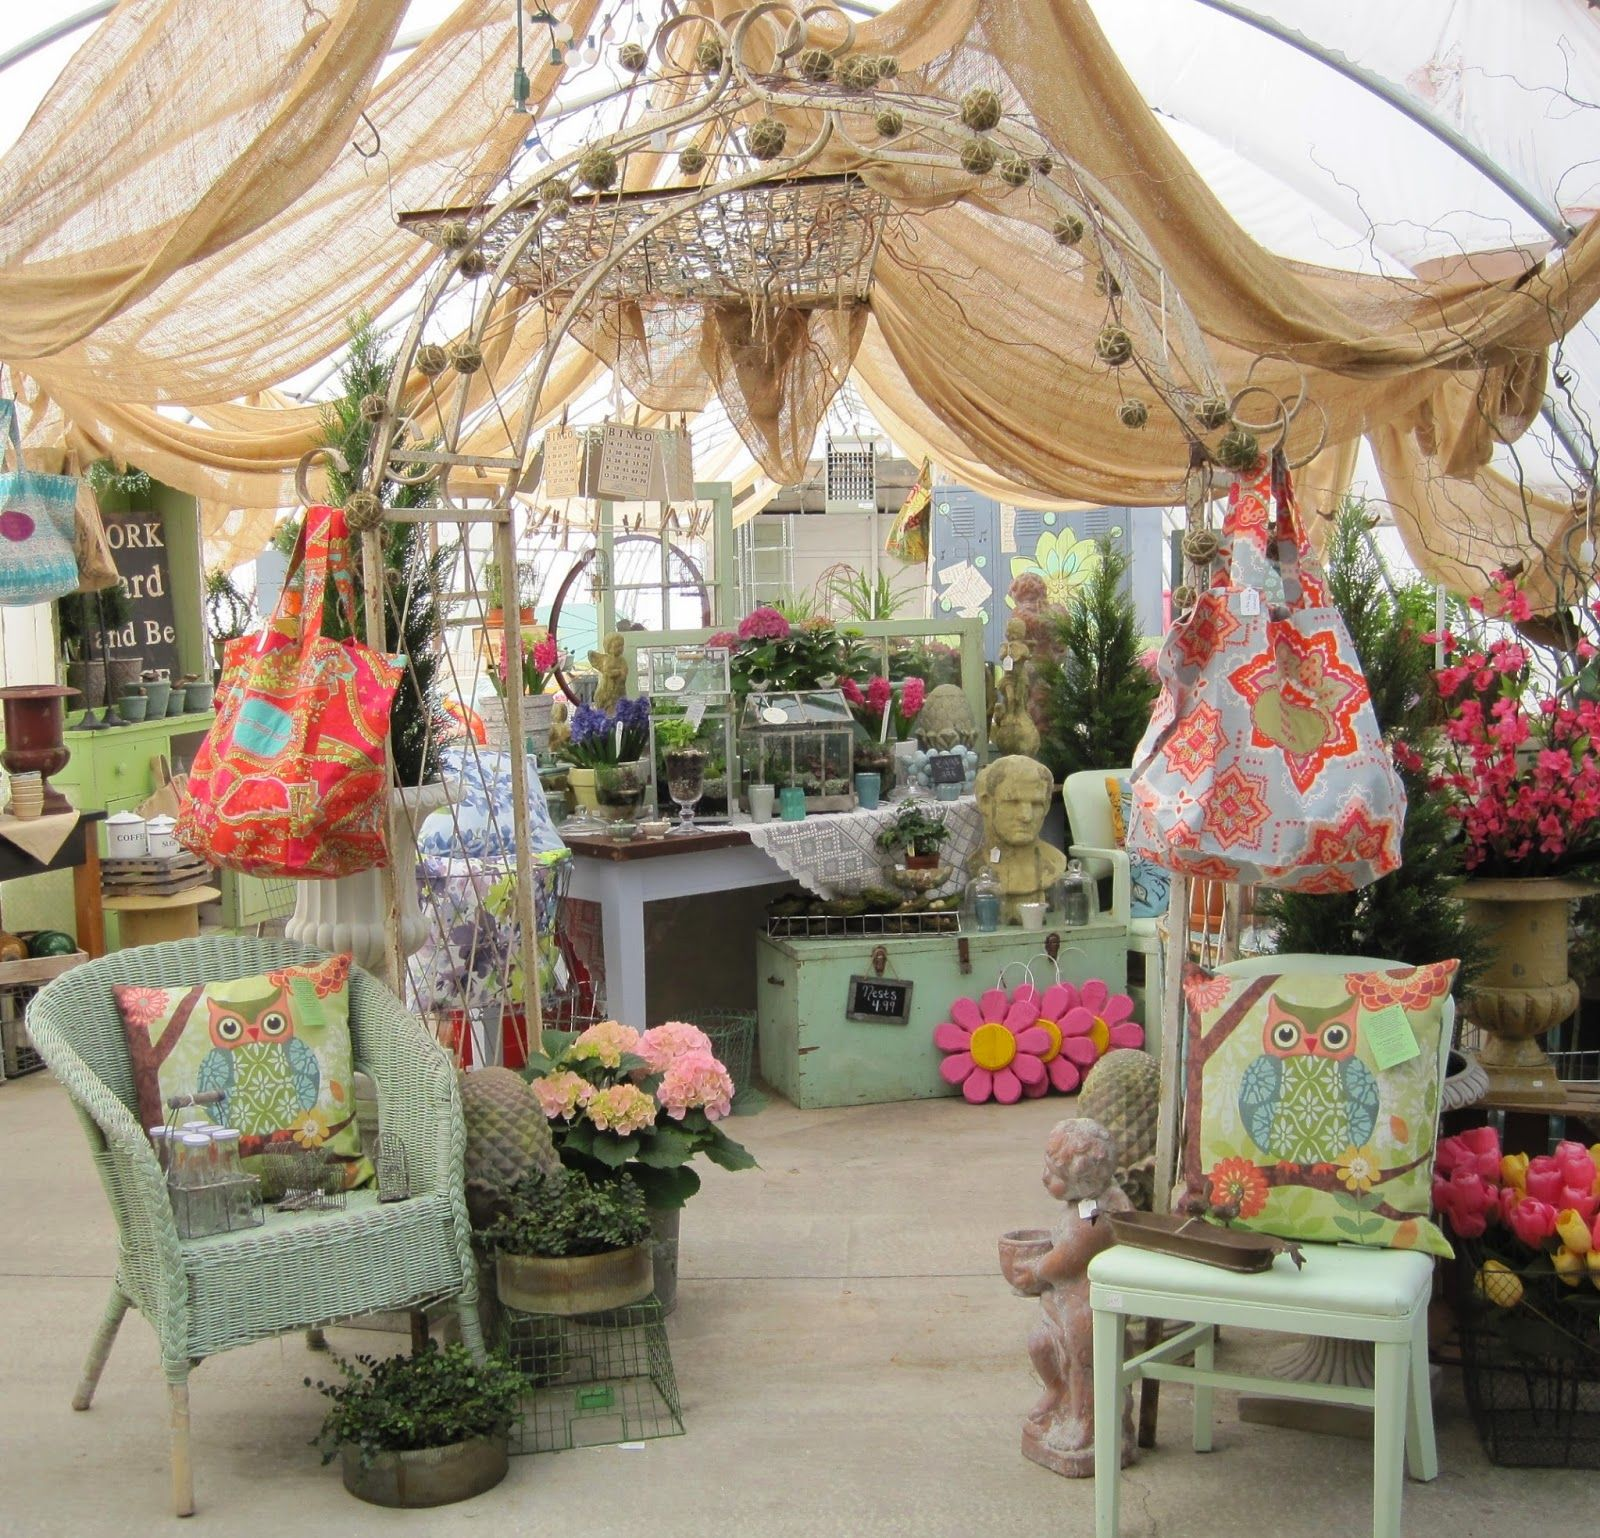 Everlasting Blooms Vintage Fun Flea Market Booth Vintage Flea